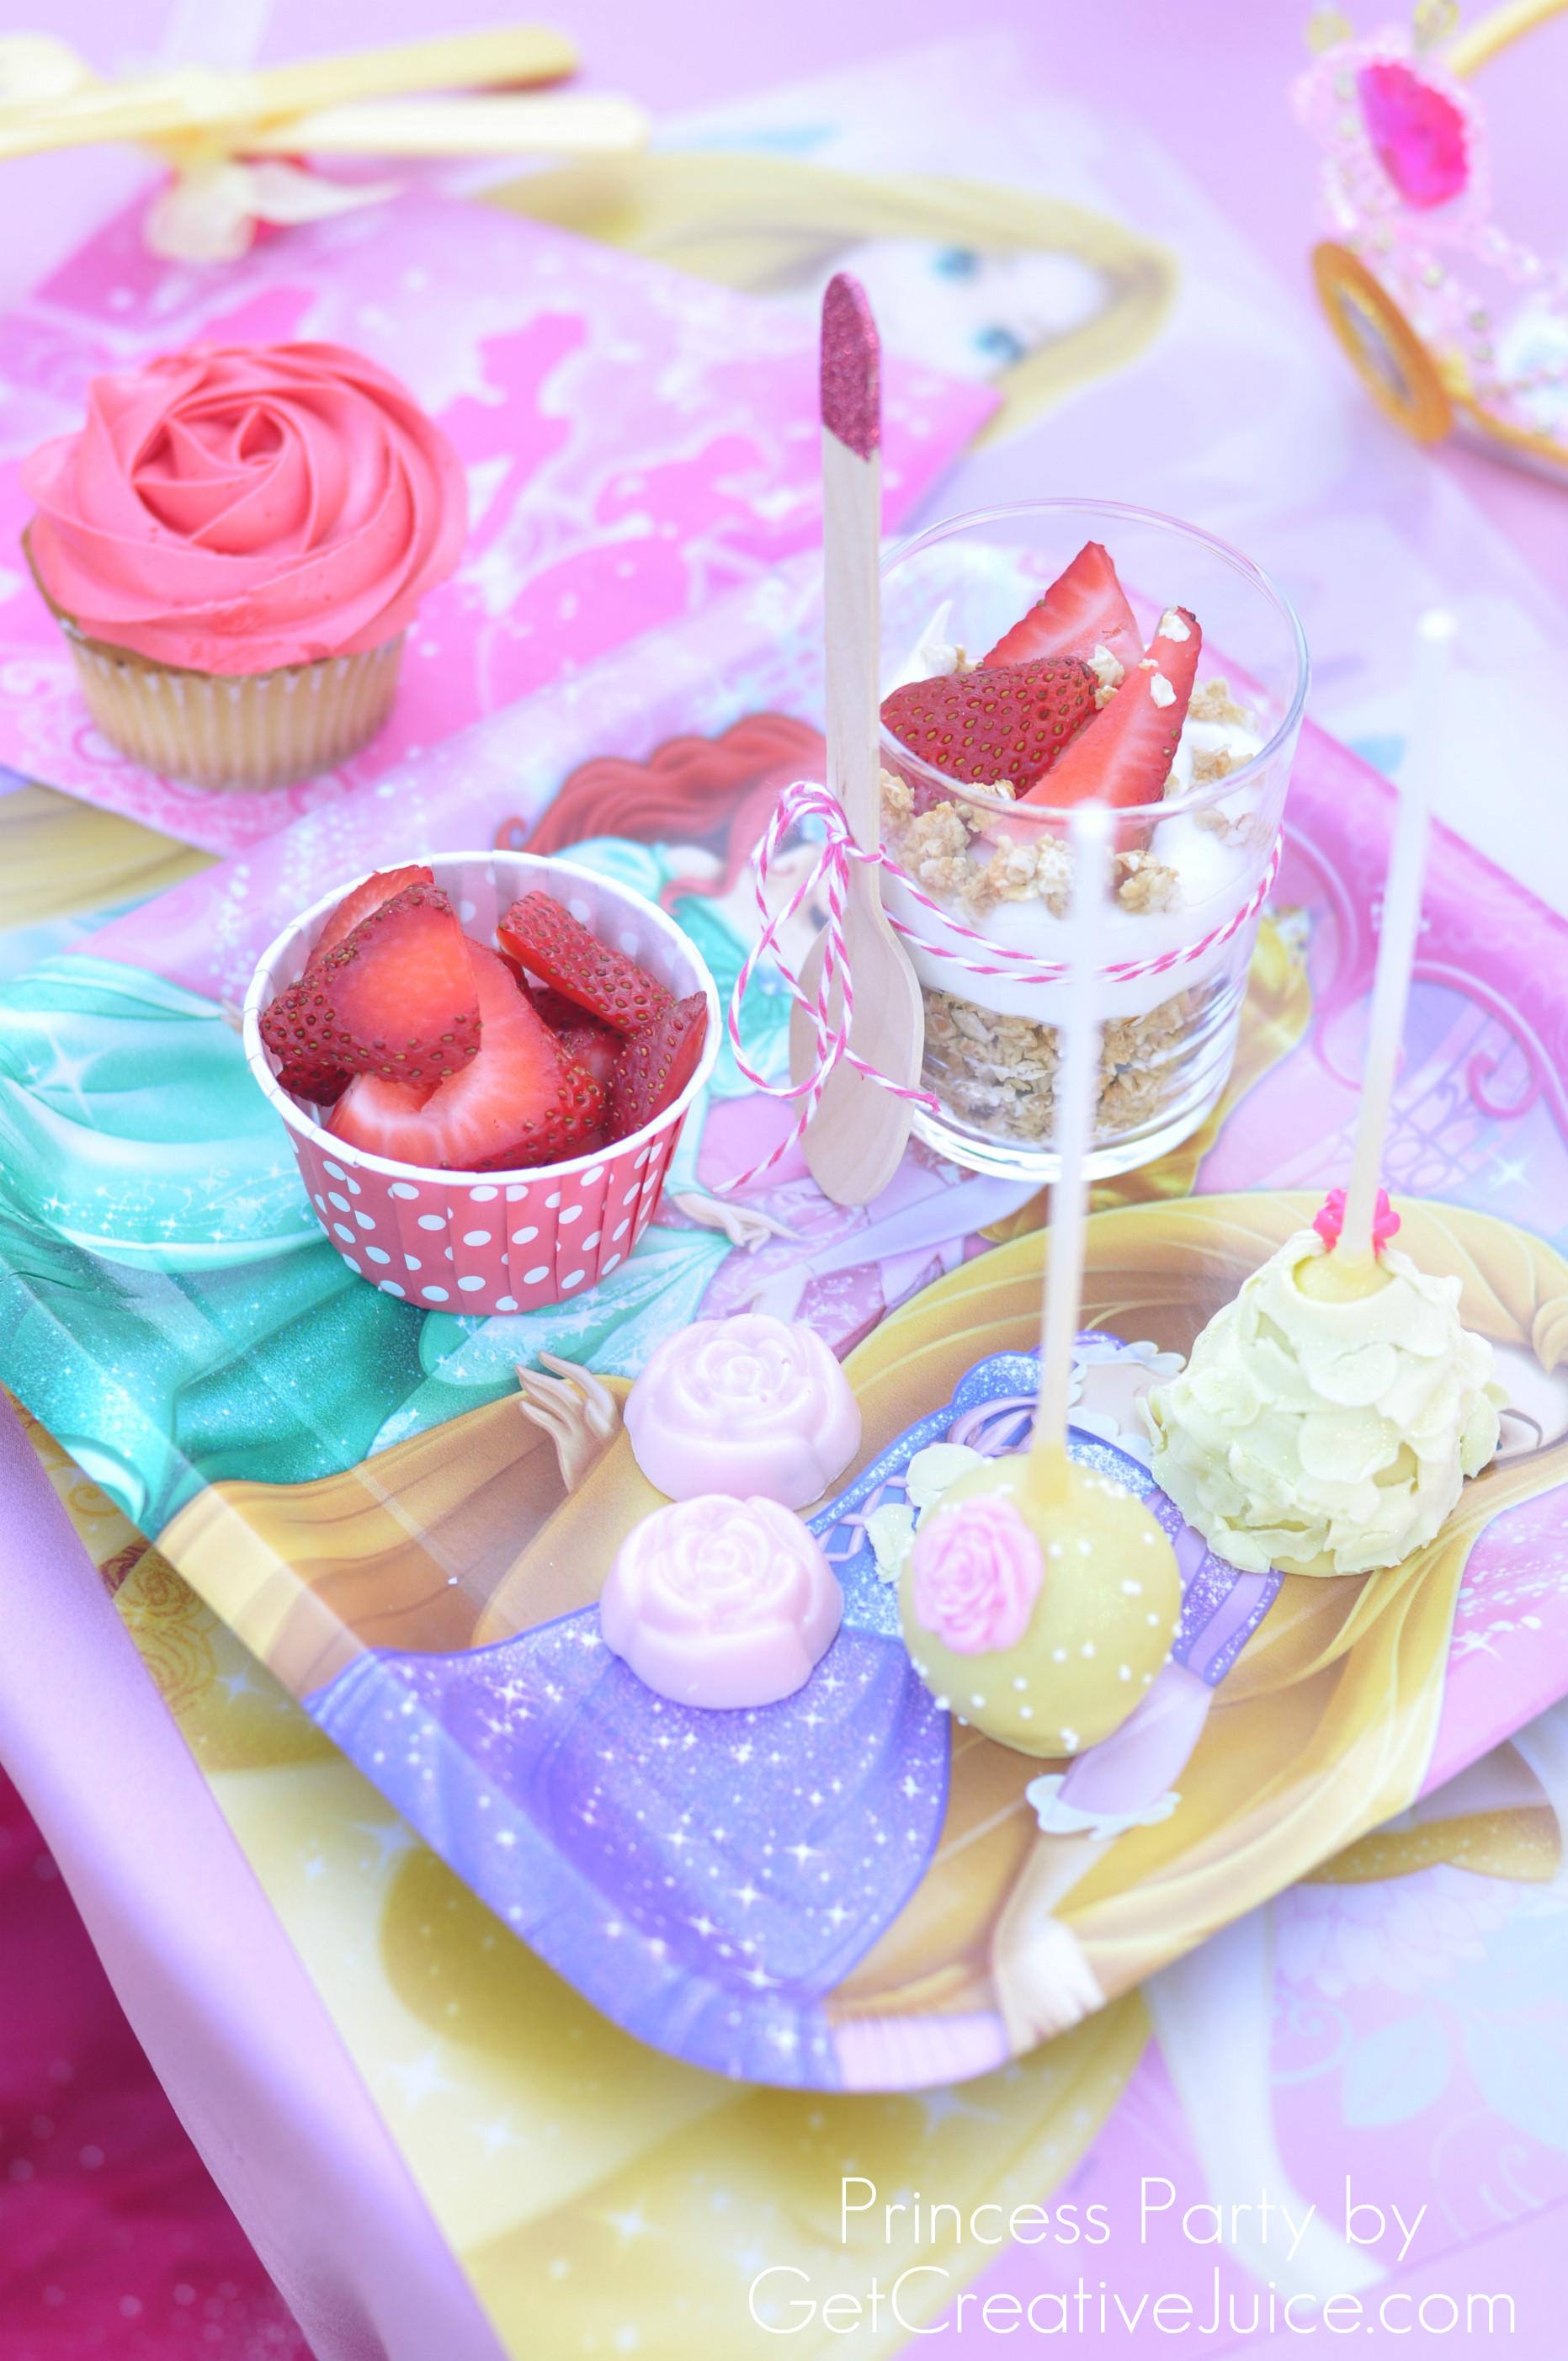 Disney Princess Party Food Ideas  Disney Princess Party with Belle Part 2 Creative Juice